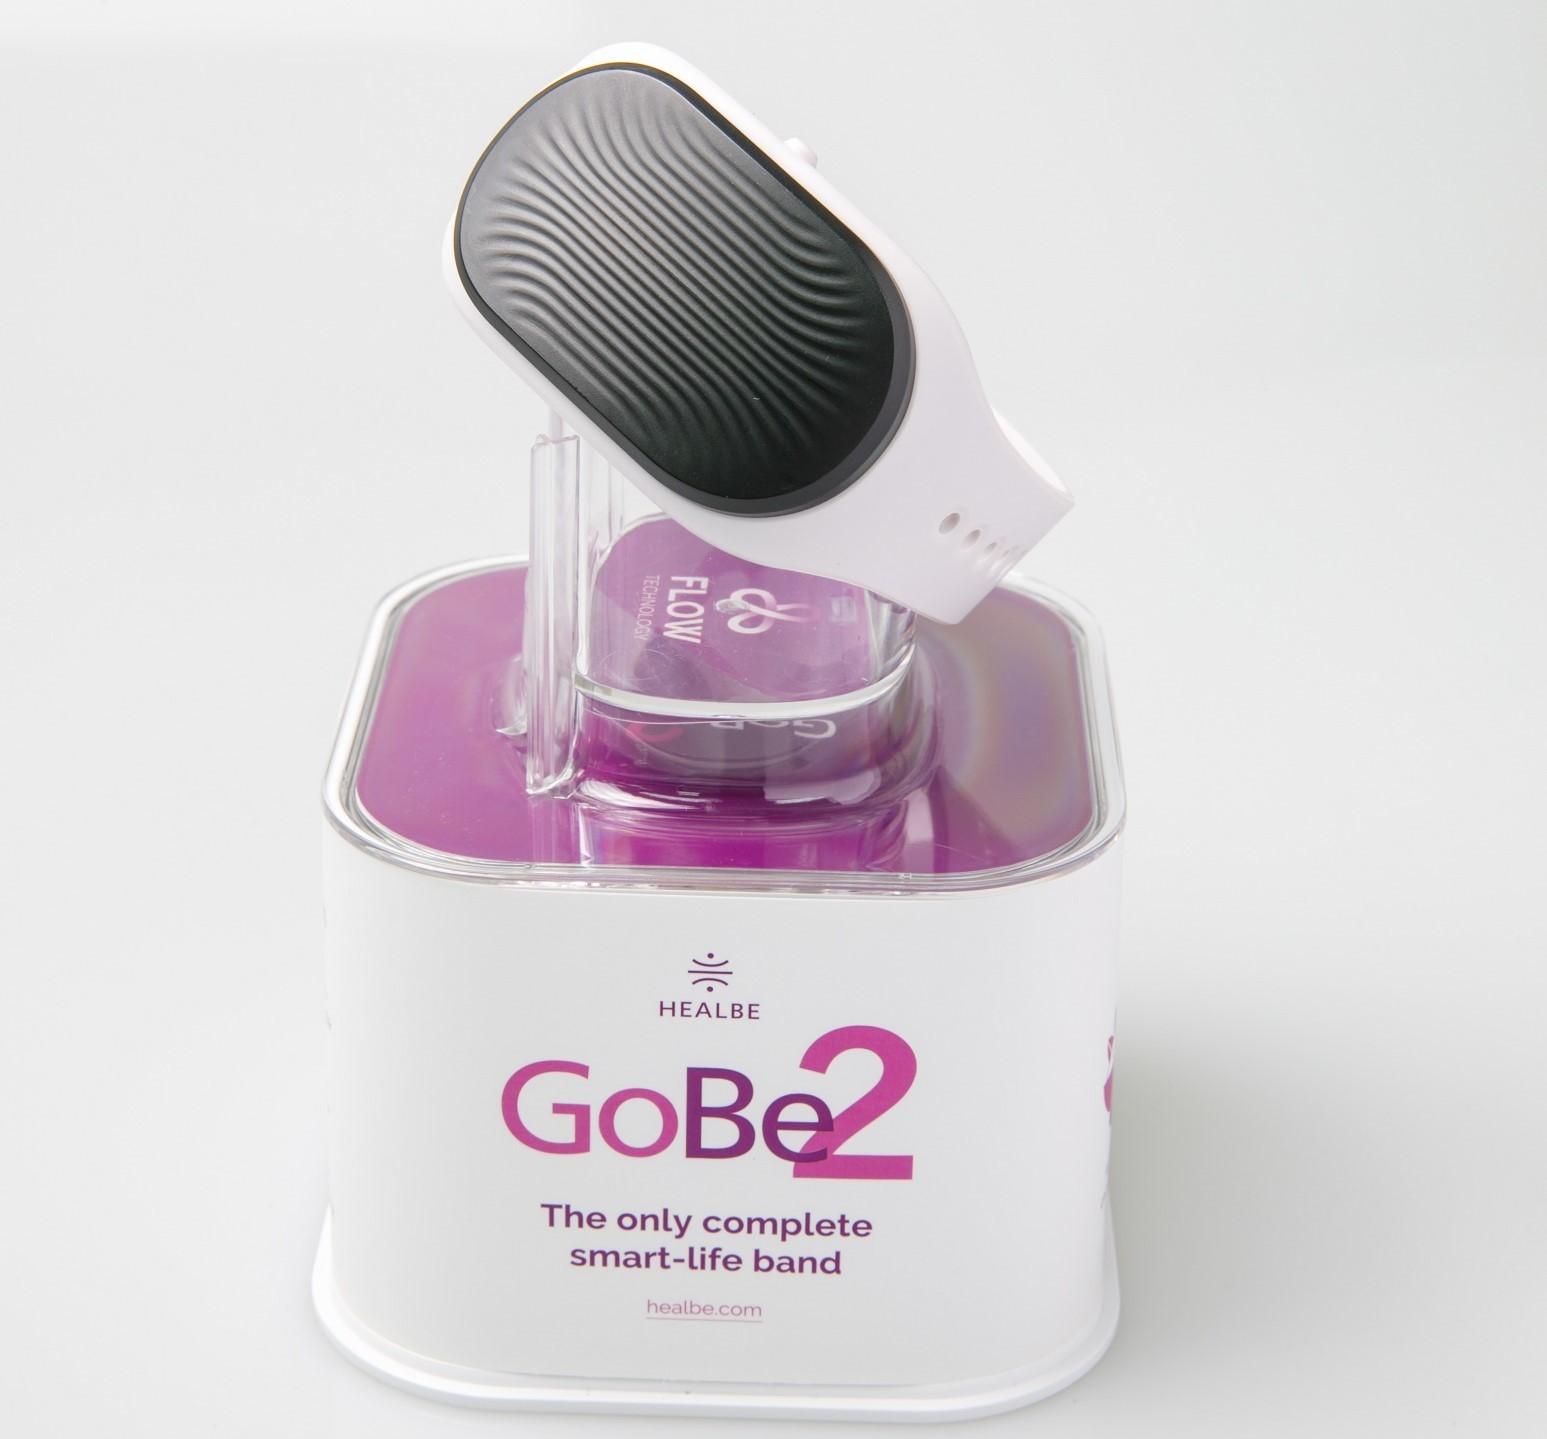 GoBe2_White 今ならEdyバンドも無料プレゼント‼